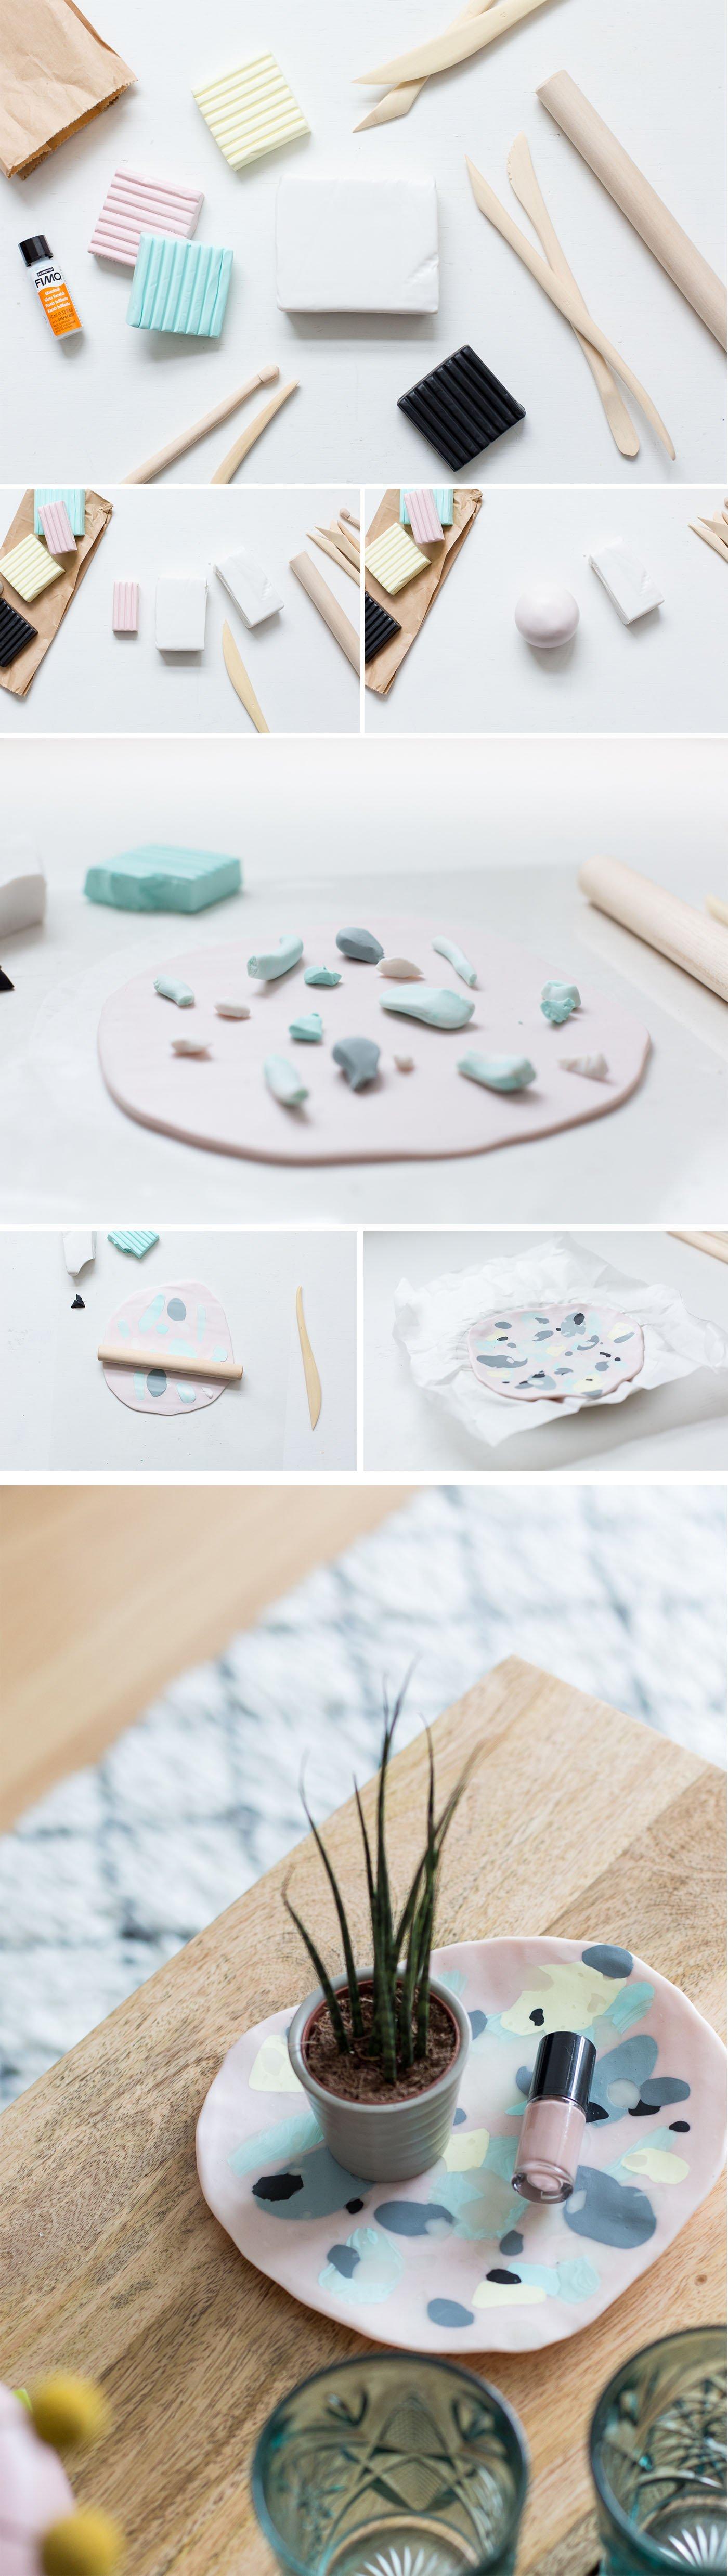 DIY Polymer Clay Coffee Table Plate